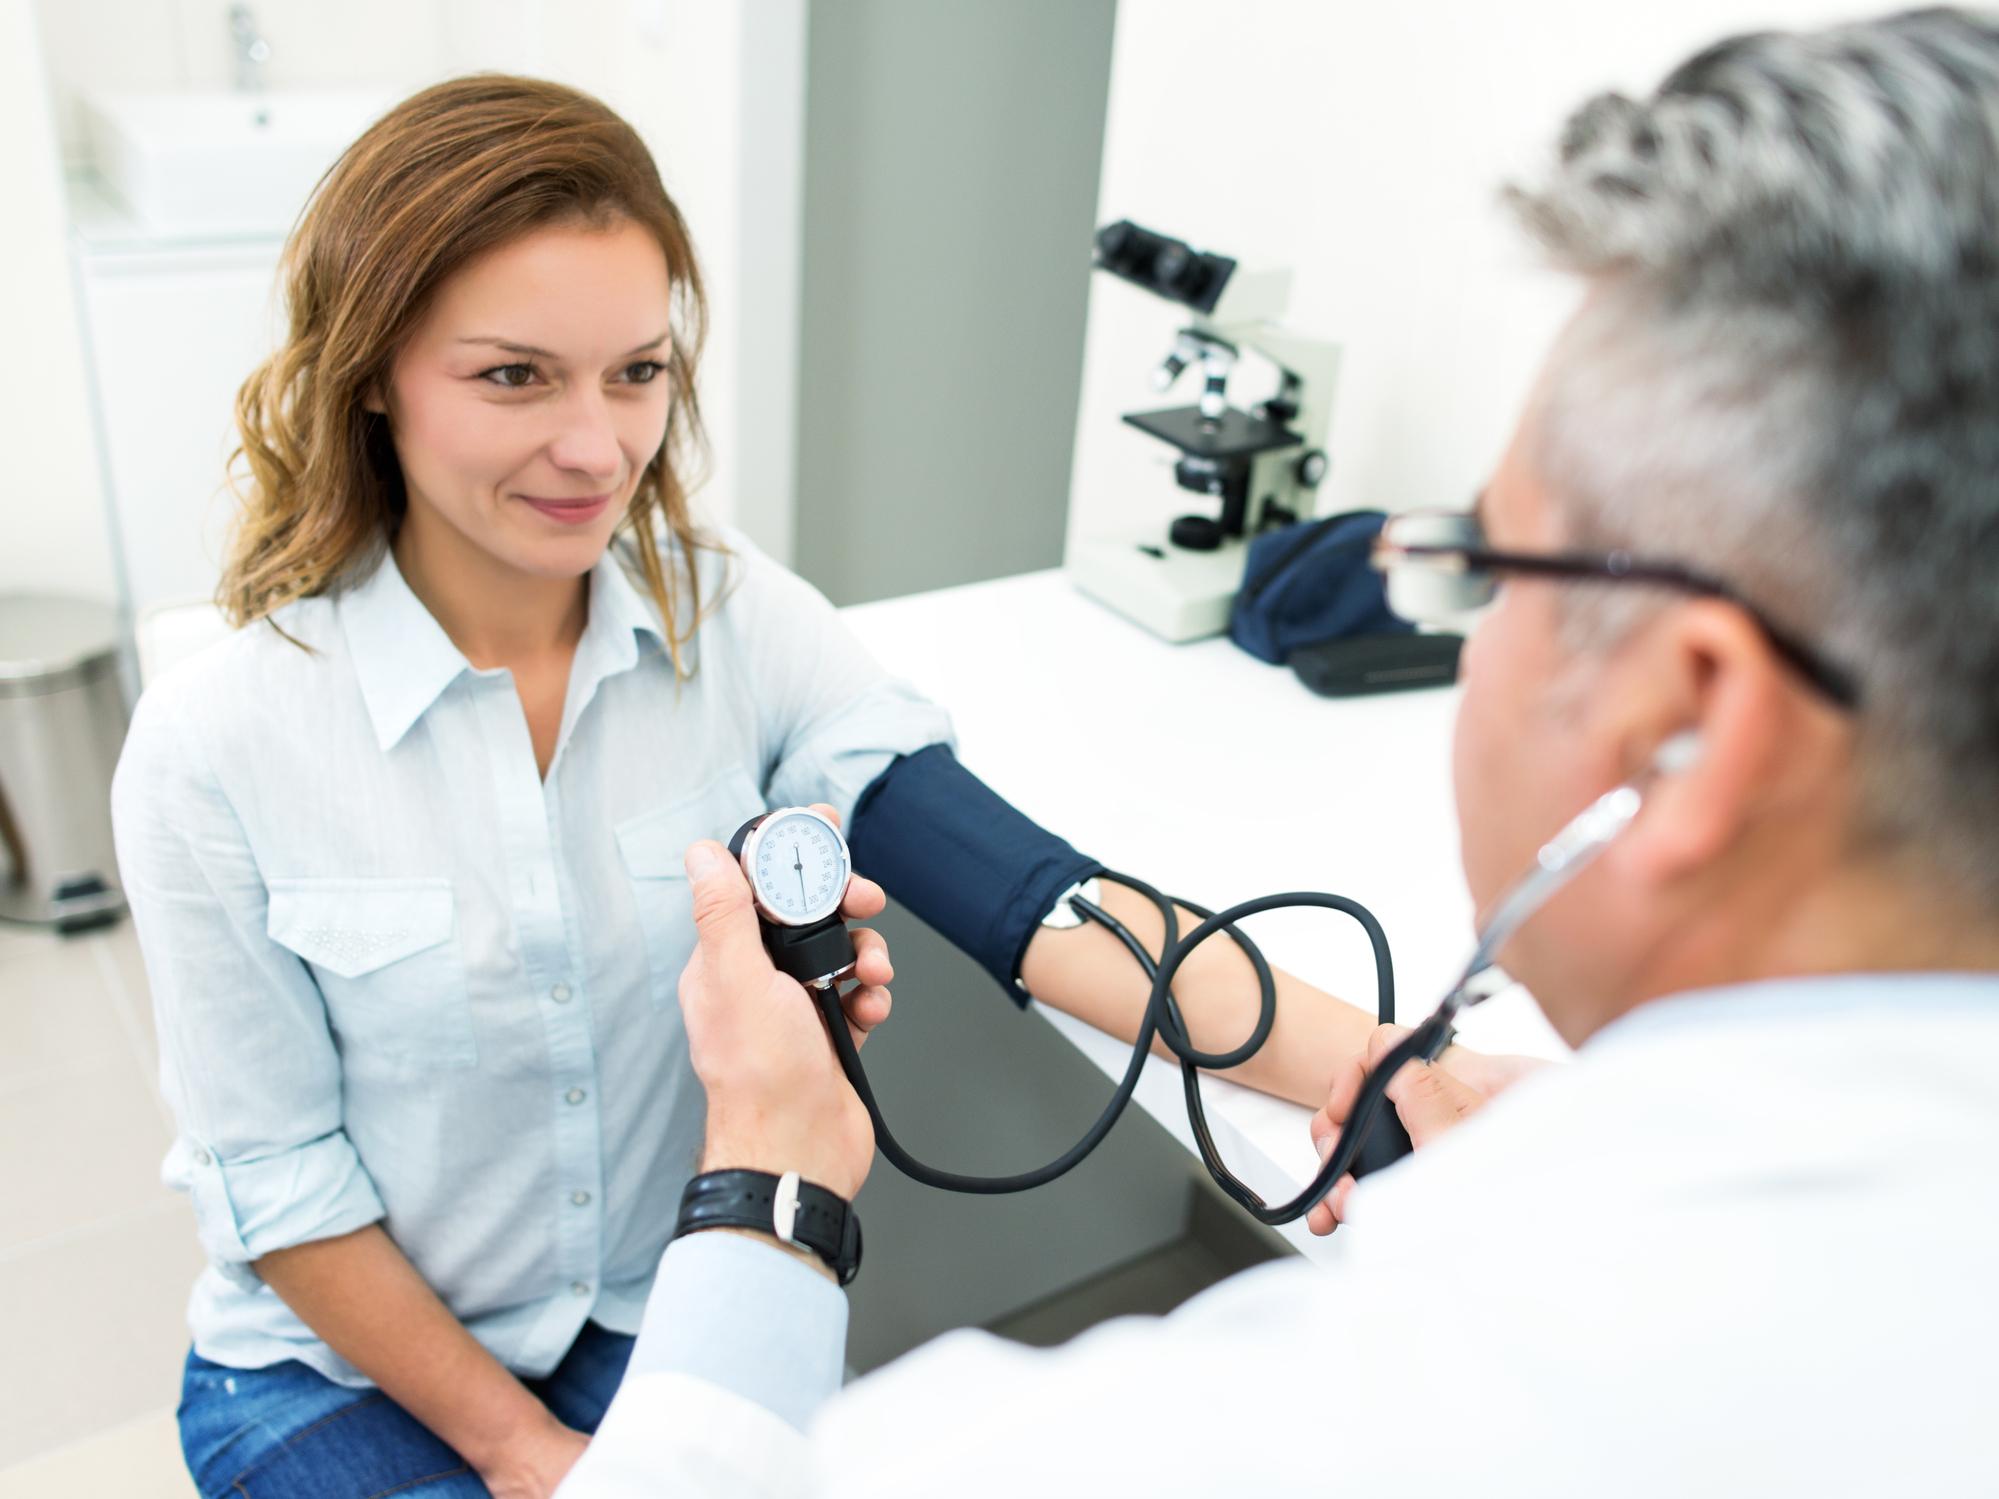 aszkorutin alkalmazása magas vérnyomás esetén uzdg magas vérnyomás esetén